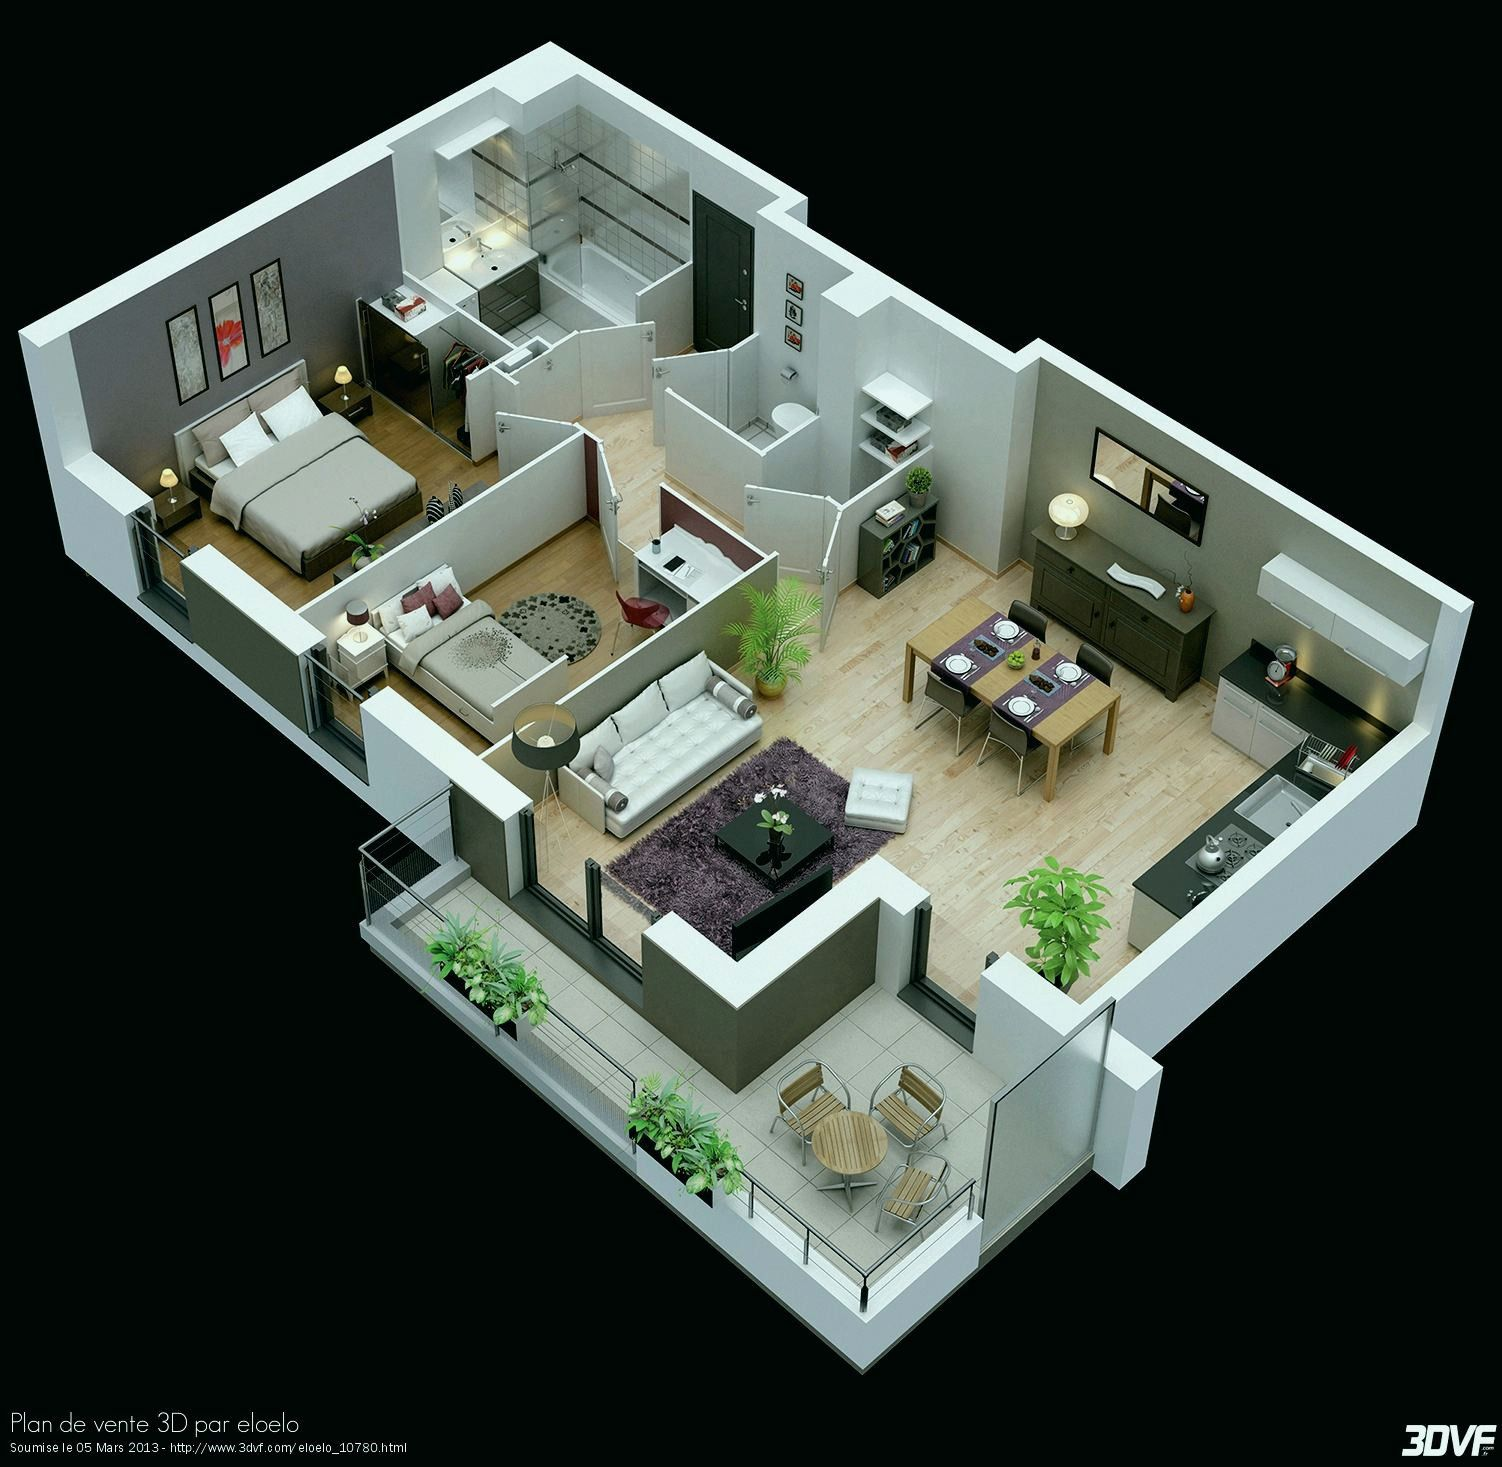 Interieur I Binnenkijken I Moderne Bungalow In Ermelo: Awesome Logiciel Architecture 3d En Ligne